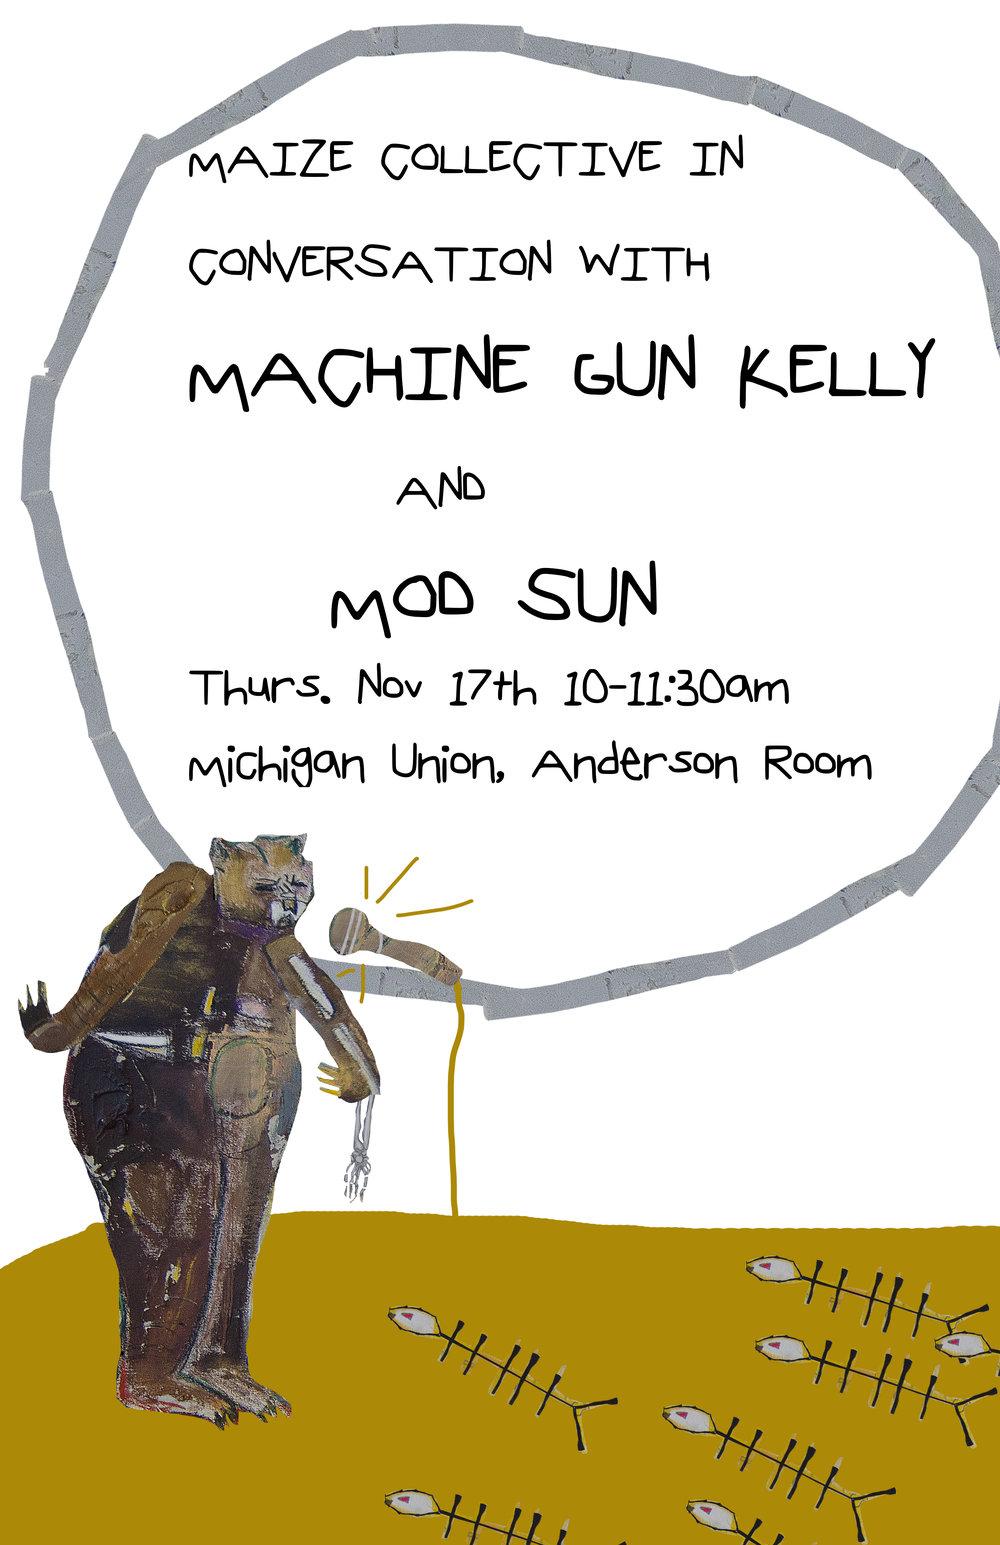 MGK poster 2.jpg